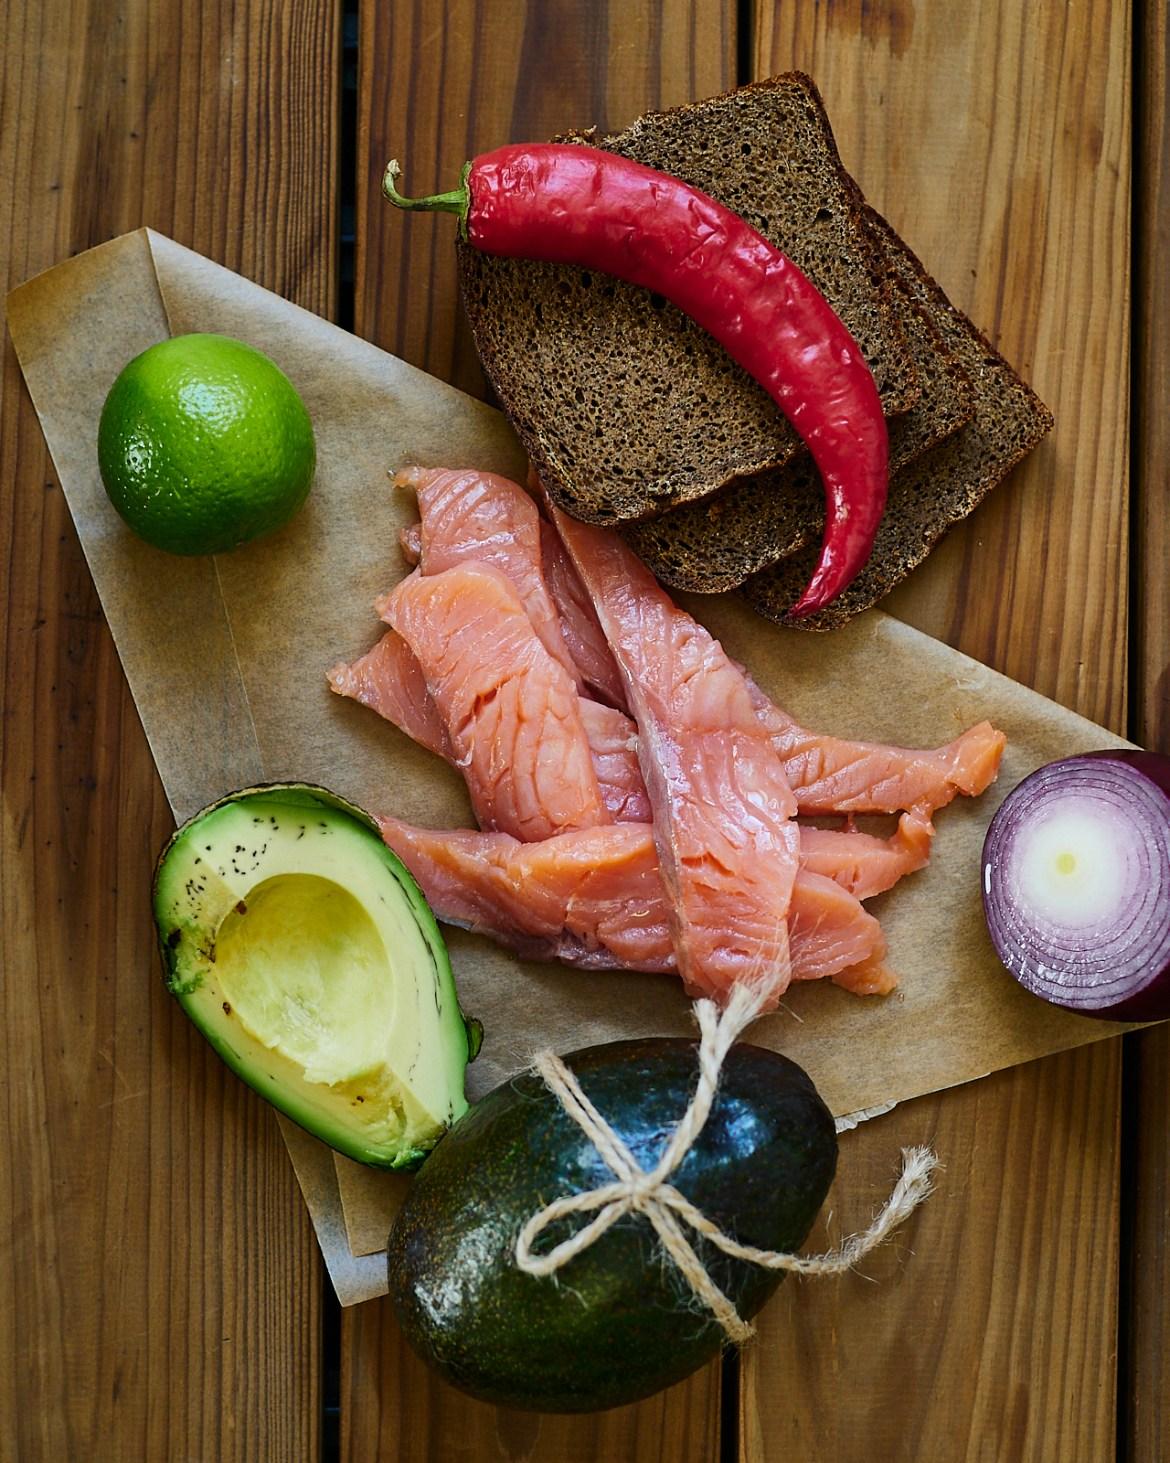 ingredinets for avocado salmon sandwich